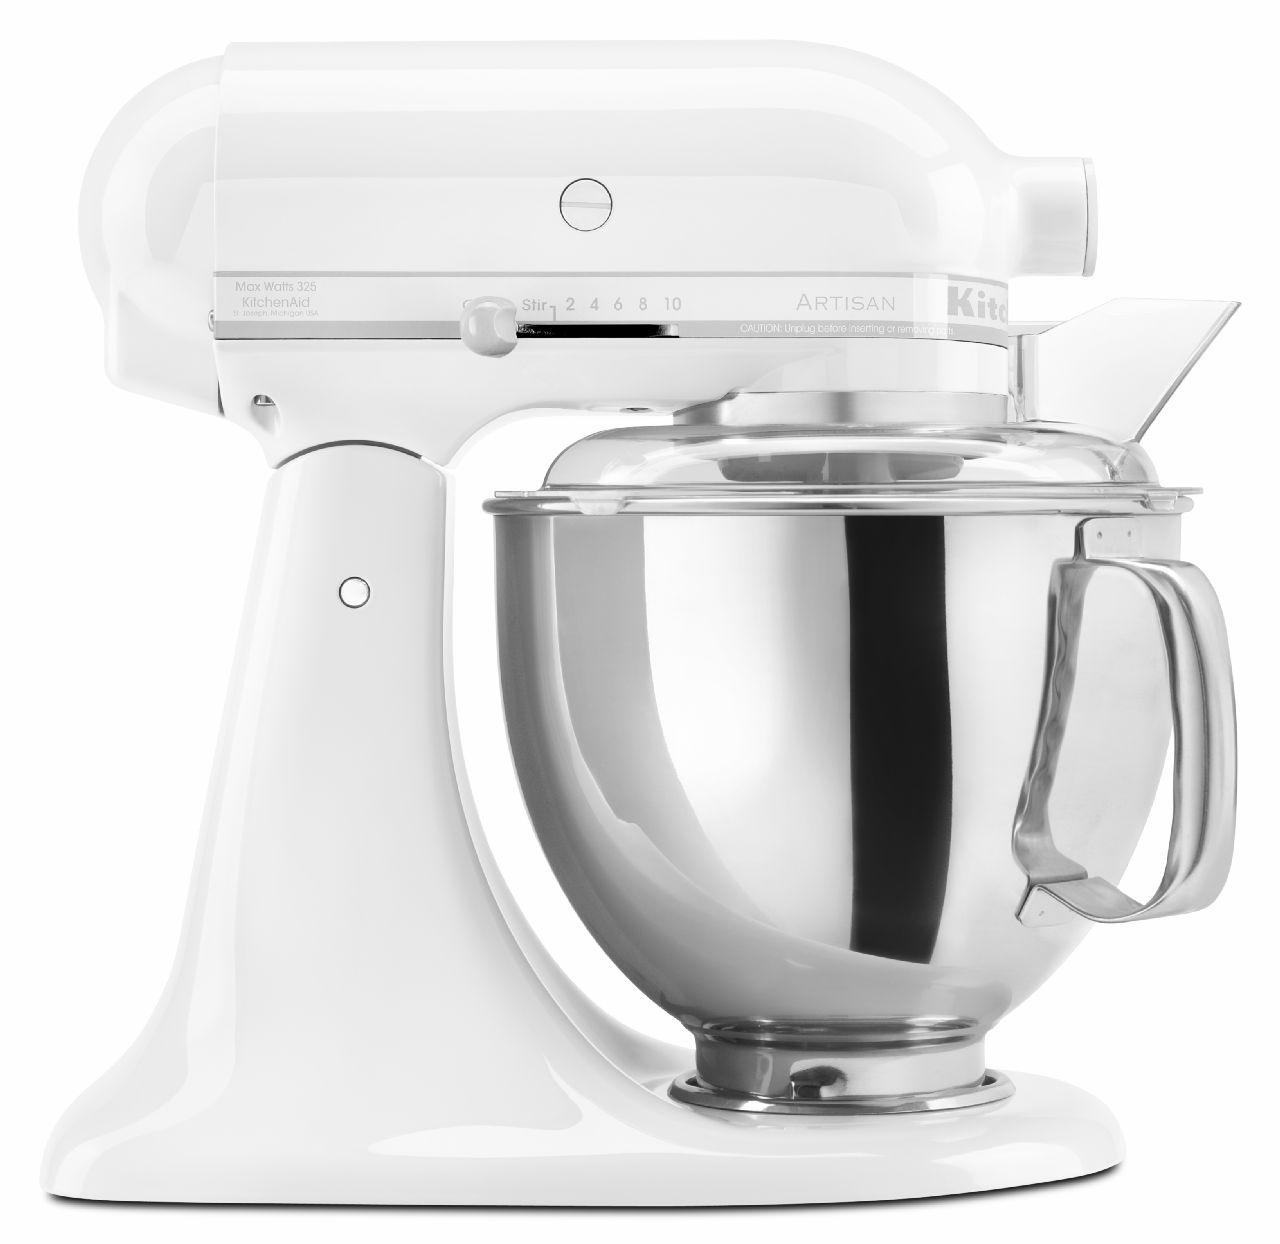 KitchenAid-Artisan-Design-Series-5-Quart-Tilt-Head-Stand-Mixer-with-Glass thumbnail 13